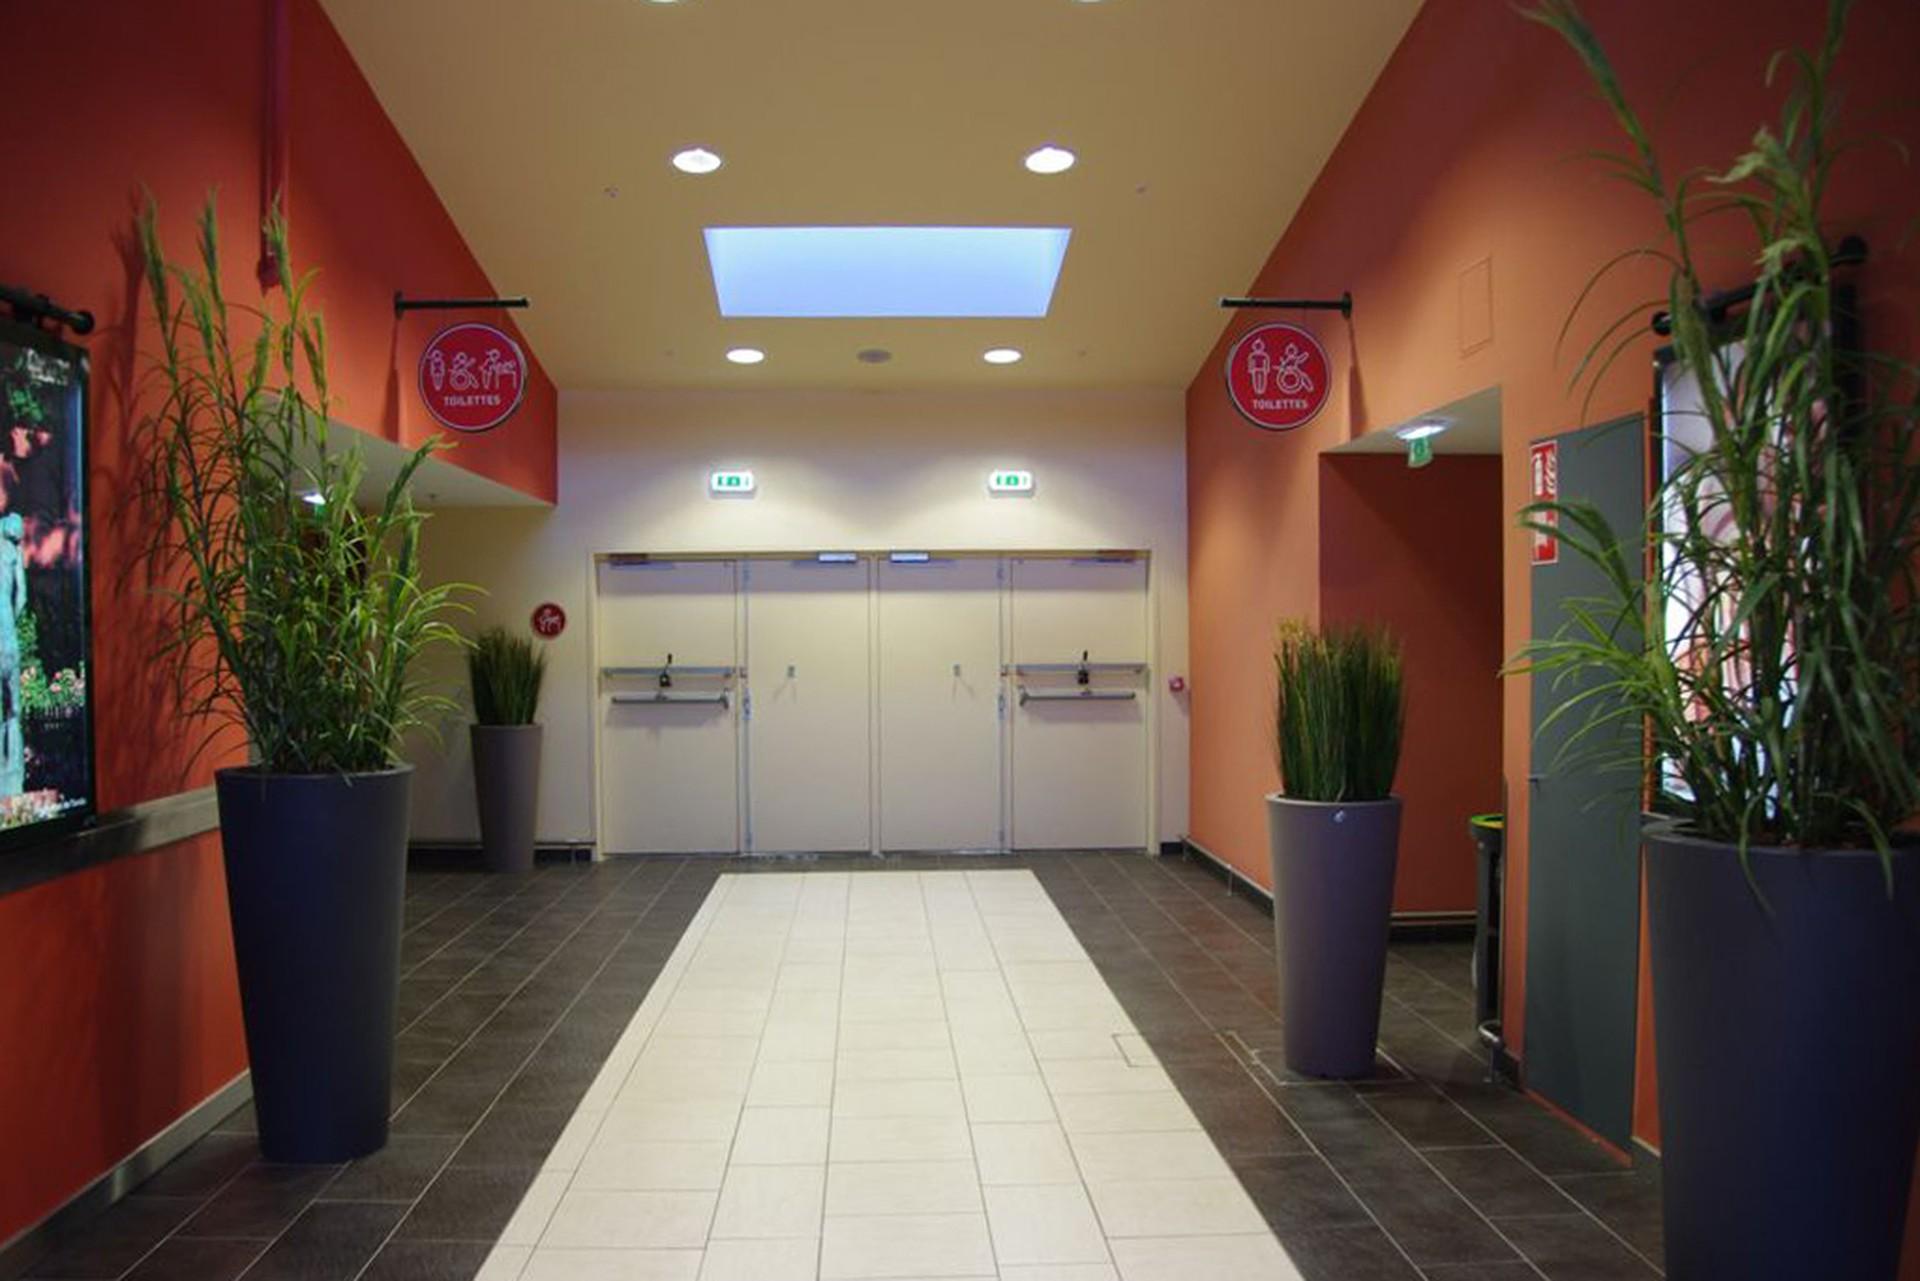 DOORTAL - Auchan Montauban - porte hall d'accueil